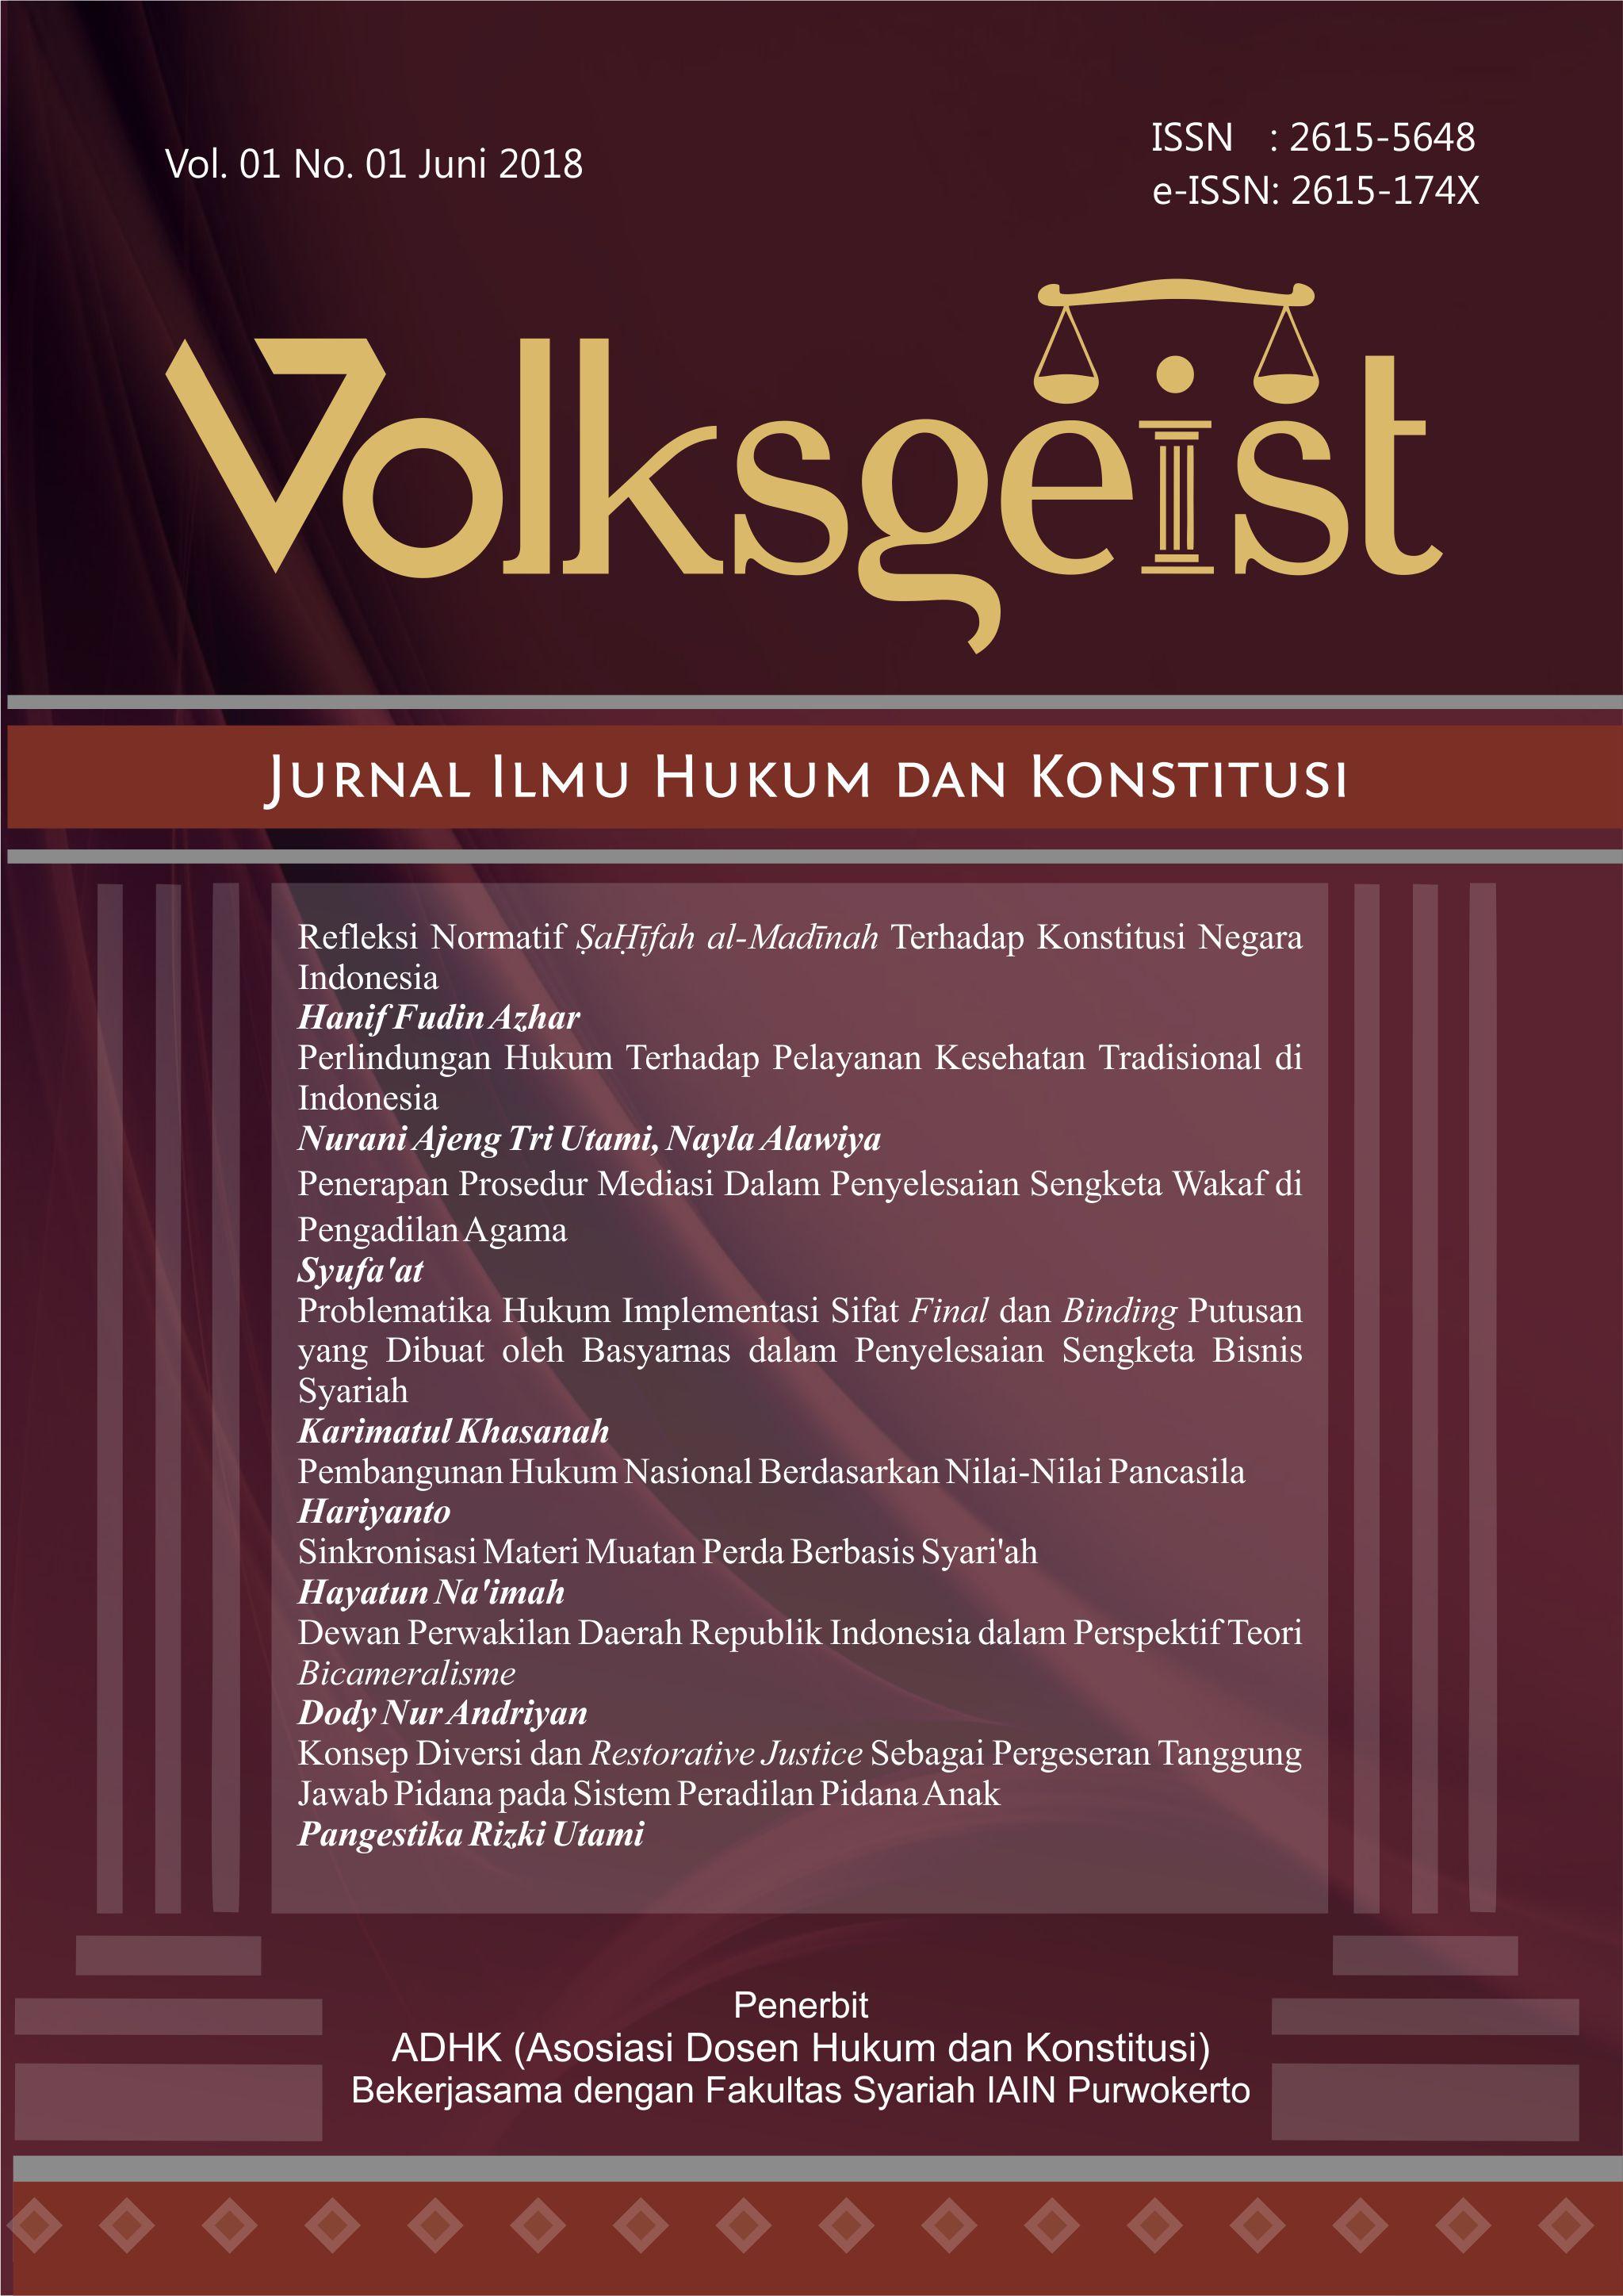 cover jurnal Volksgeist Jurnal Ilmu Hukum dan Konstitusi